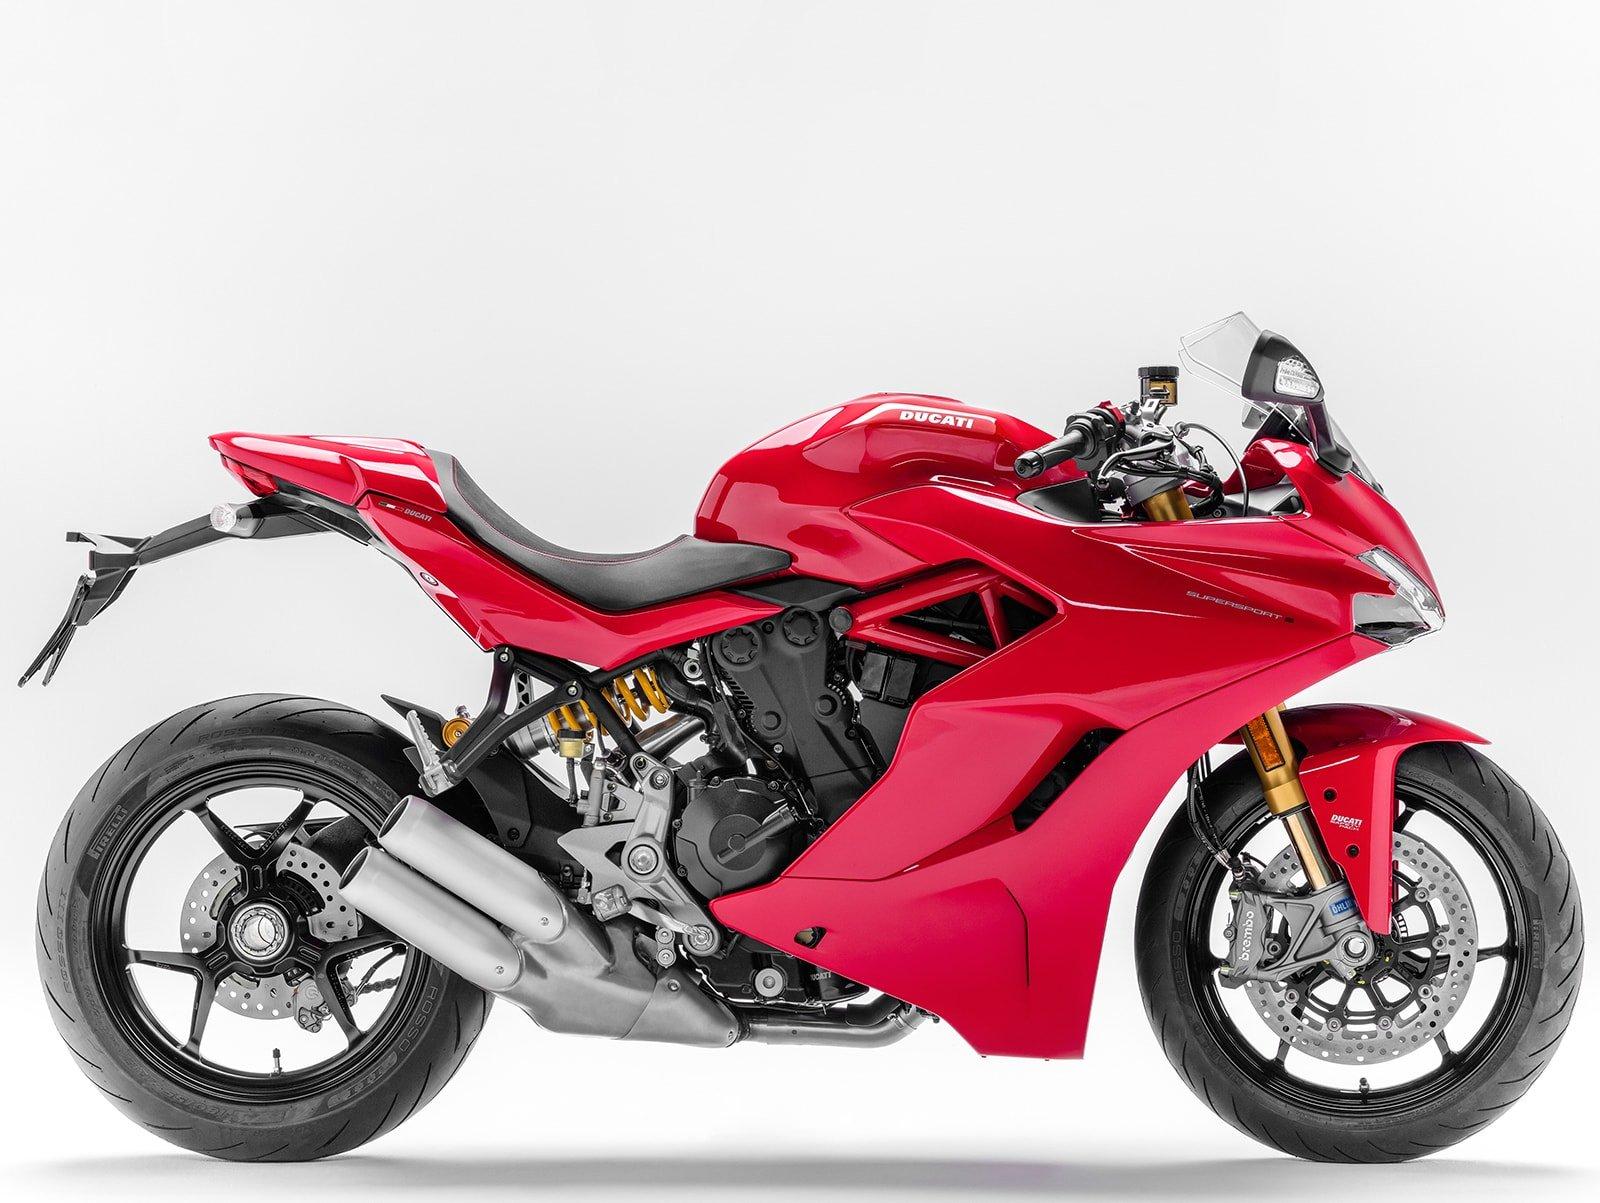 Мотоцикл DUCATI SuperSport S - Red (2018)